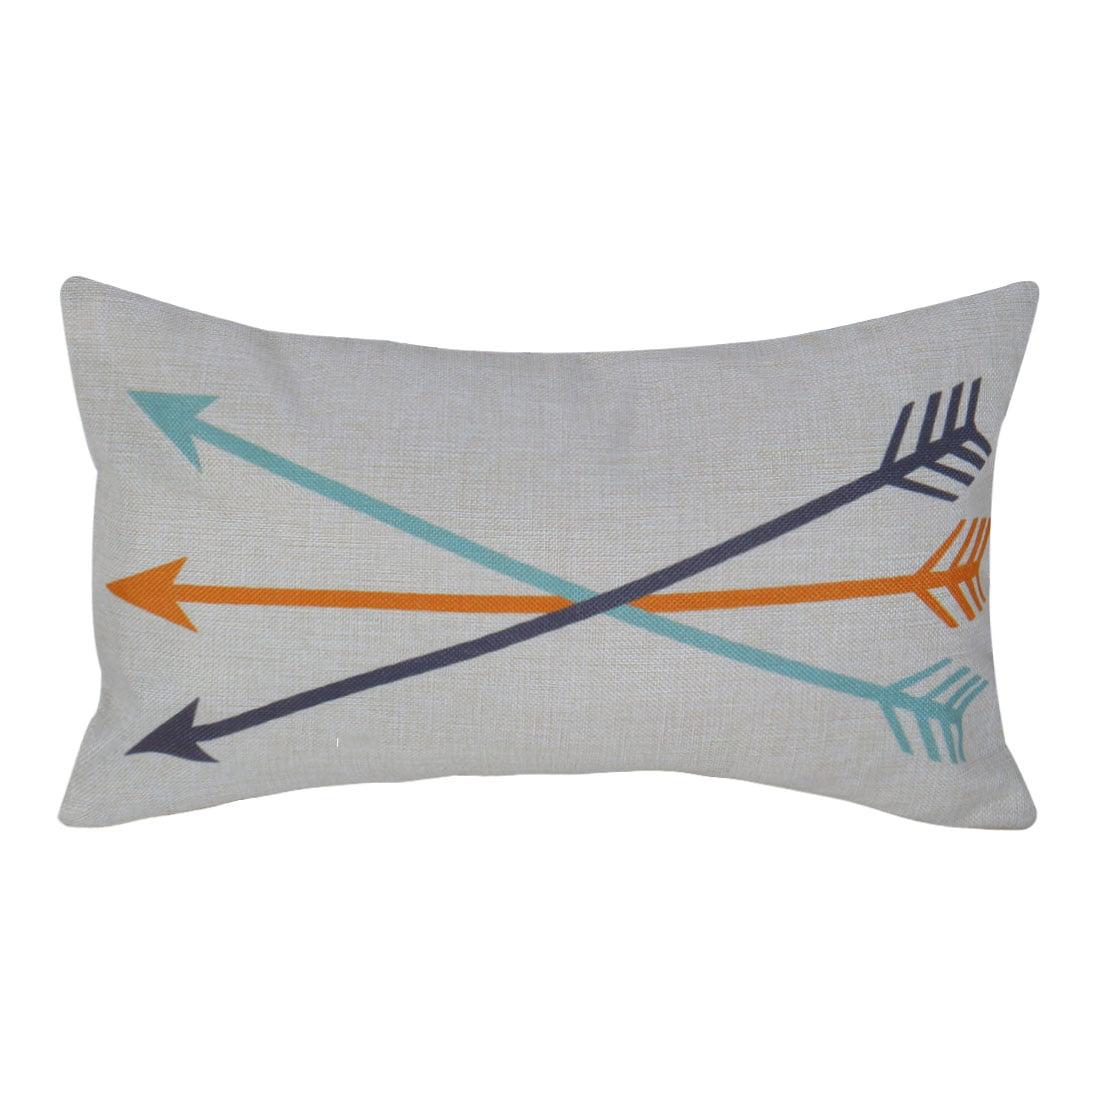 Image of: Home Sofa Bed Chair Decorative Lumbar Pillow Cover Cushion Case 12 X 20 Inch W Hidden Zipper Walmart Com Walmart Com